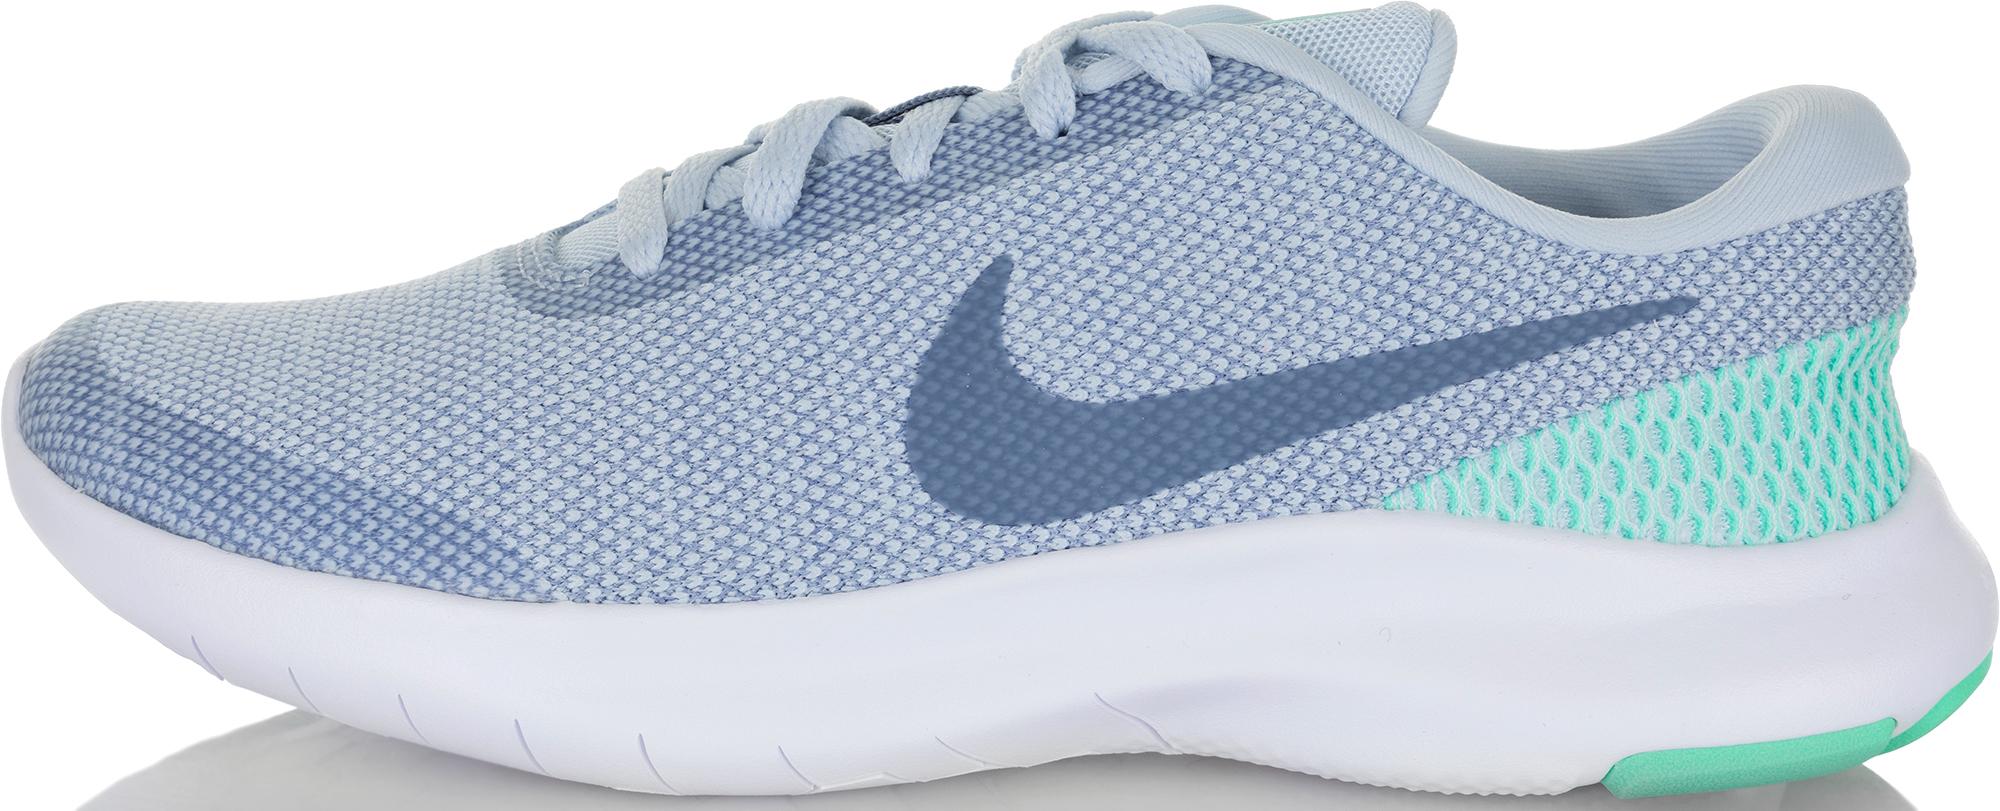 Nike Кроссовки женские Nike Flex Experience RN 7, размер 39 цена